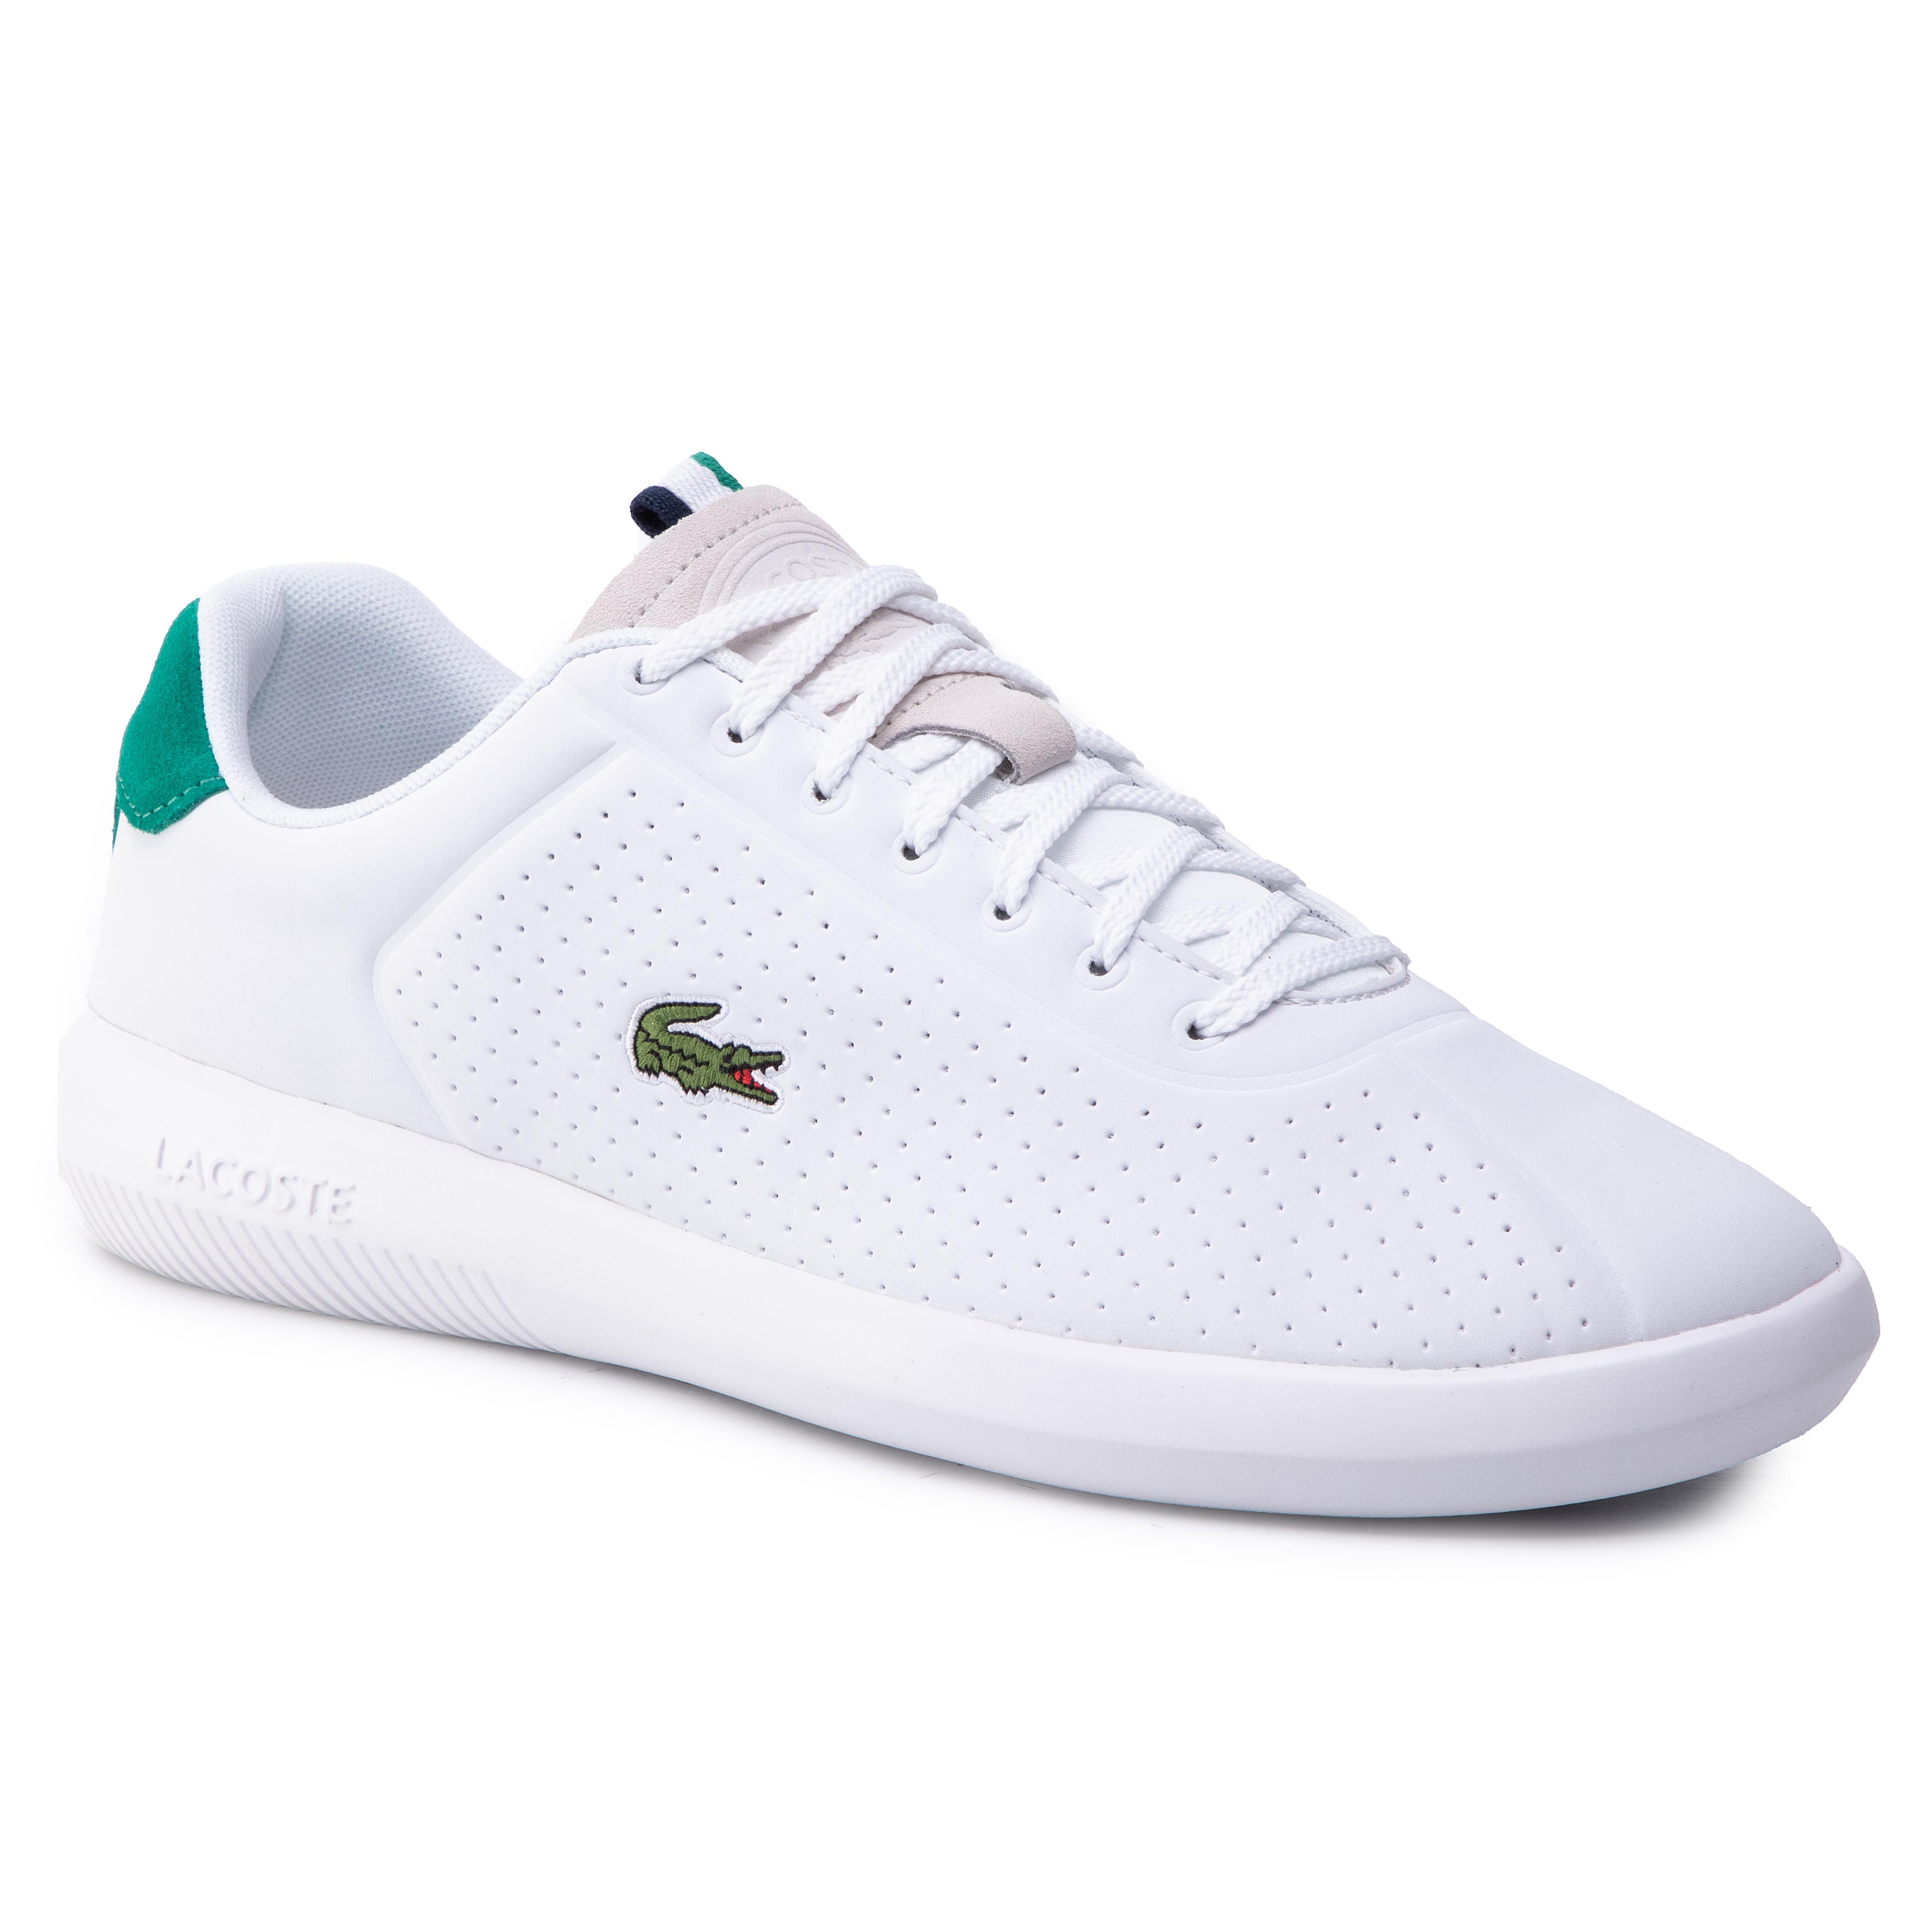 Whtwht Lacoste Sneakers Sma 7 4 37sma004021g Nnw80mov Novas 119 YbH9eEDIW2